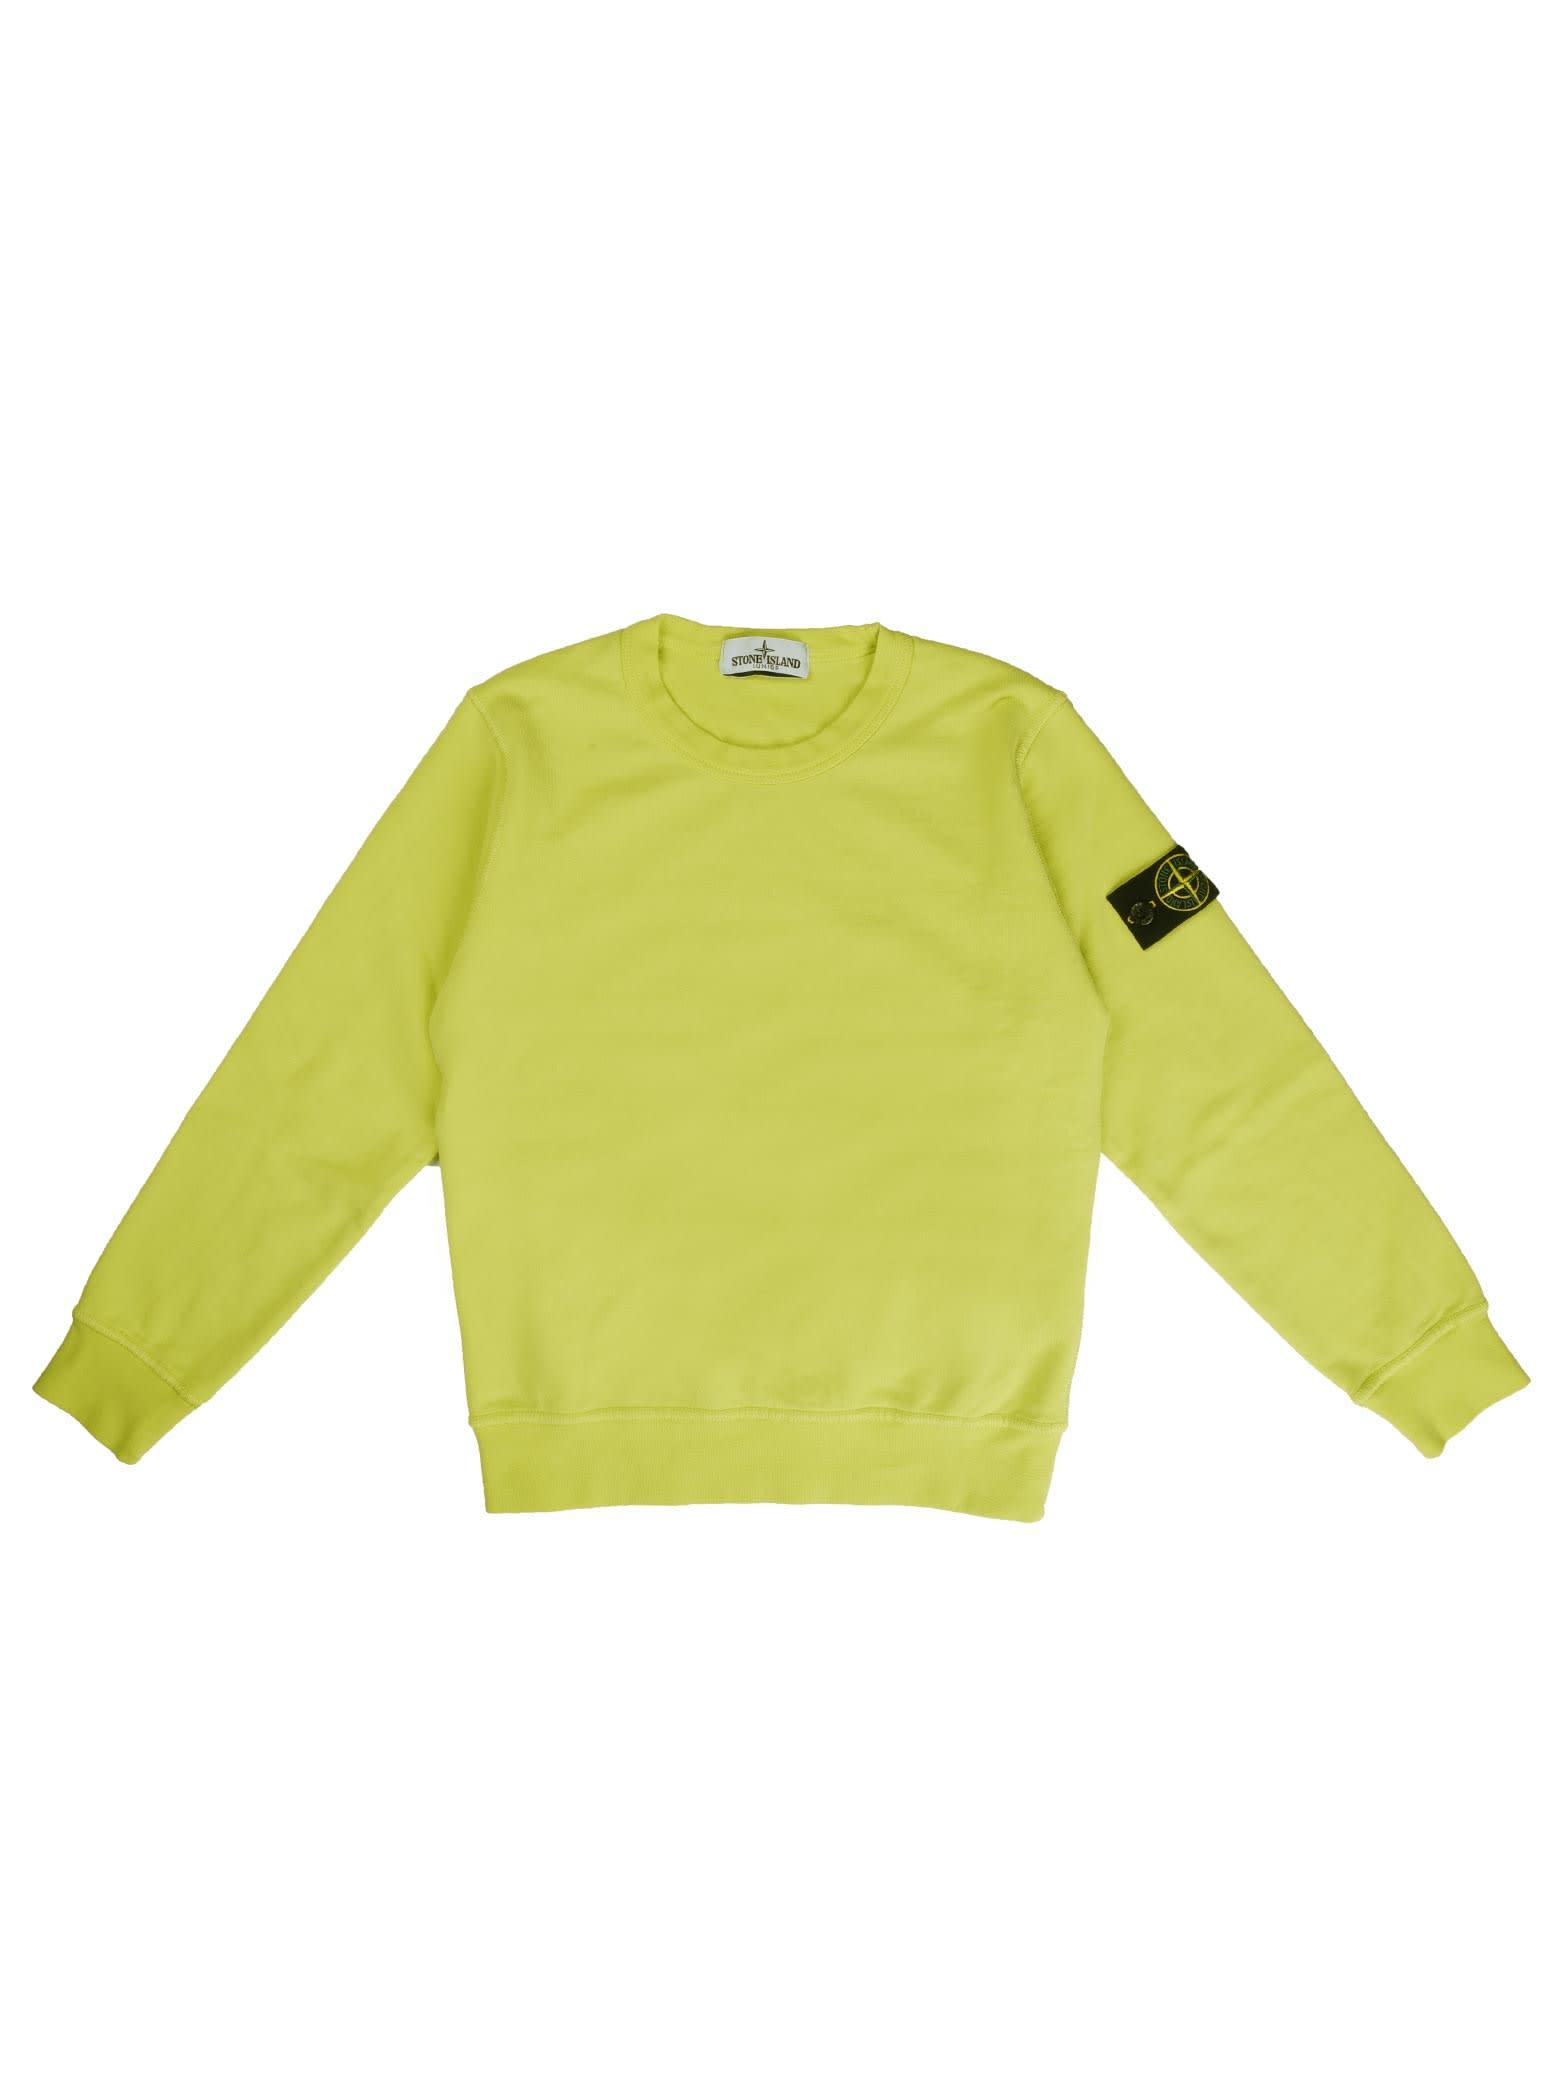 Stone Island Fluo Crew Neck Sweatshirt